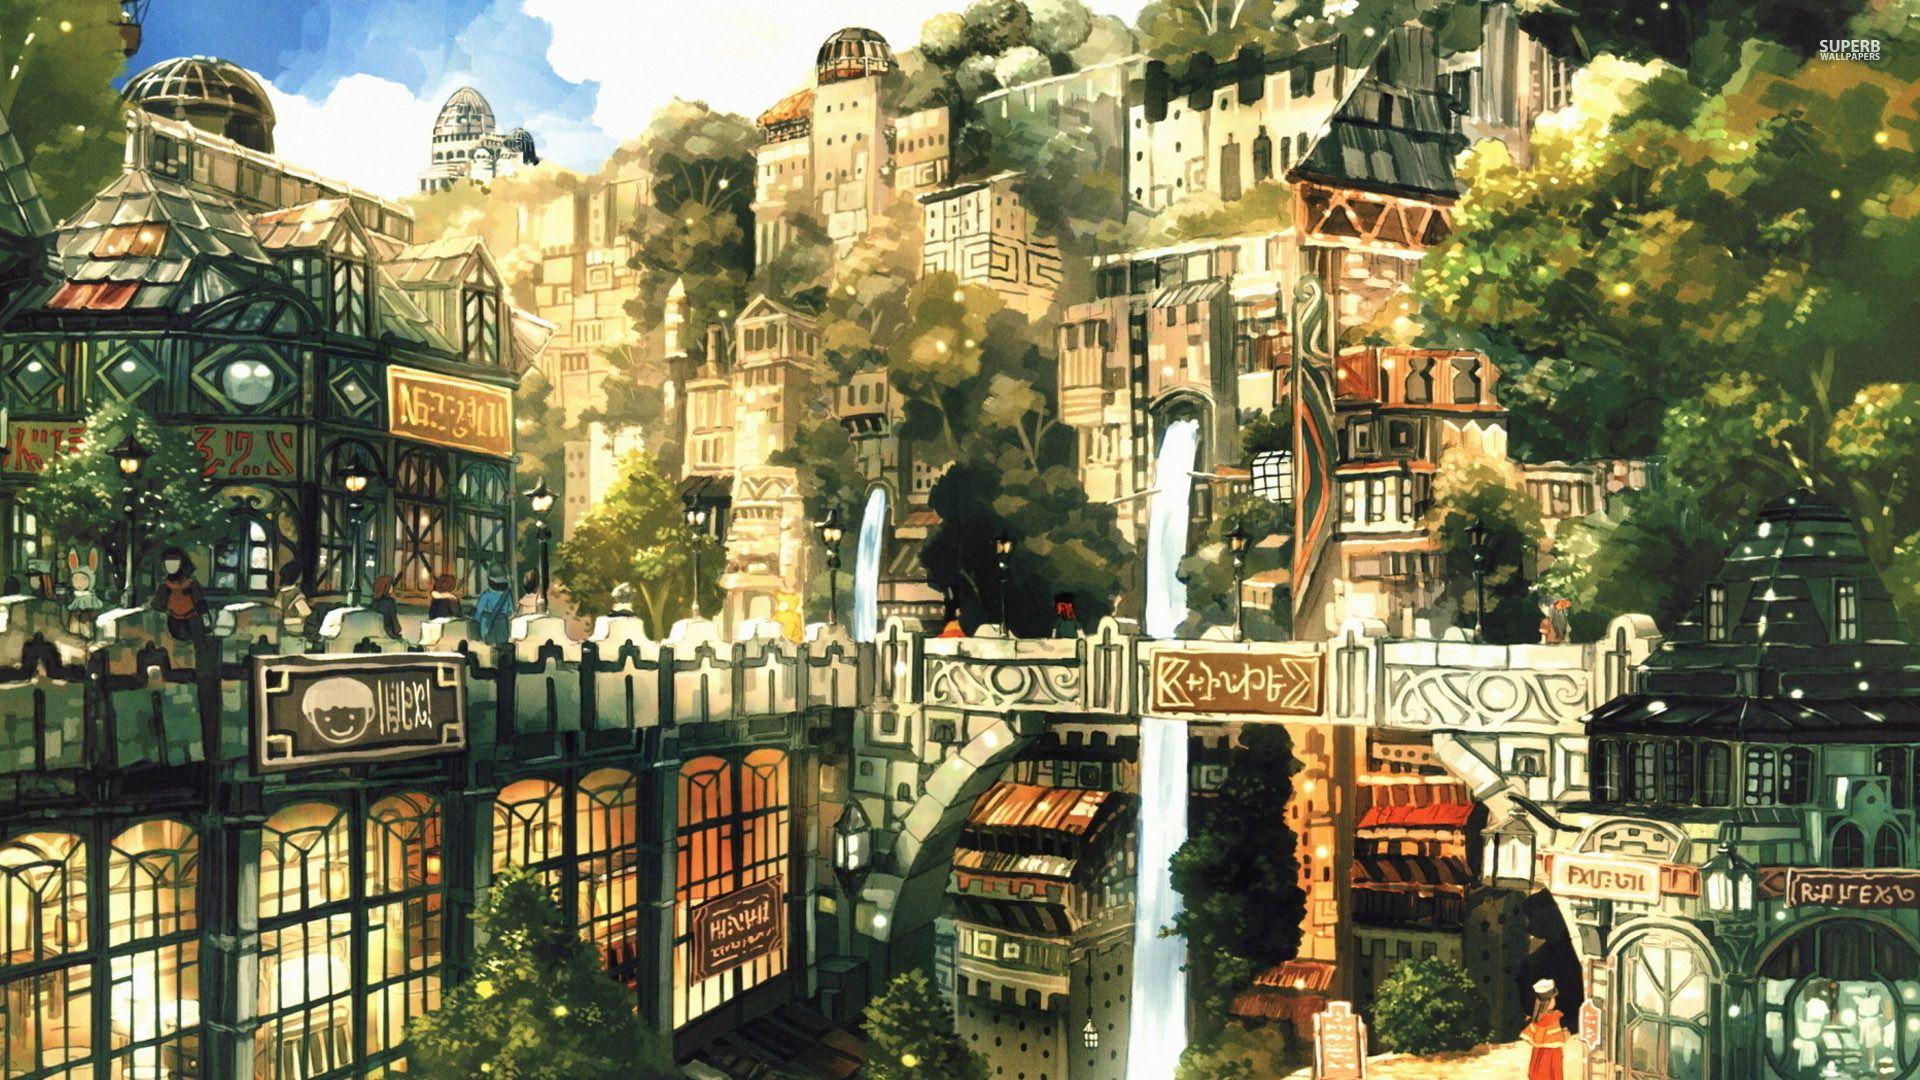 Post-apocalyptic city wallpaper | Anime city, Fantasy city ...